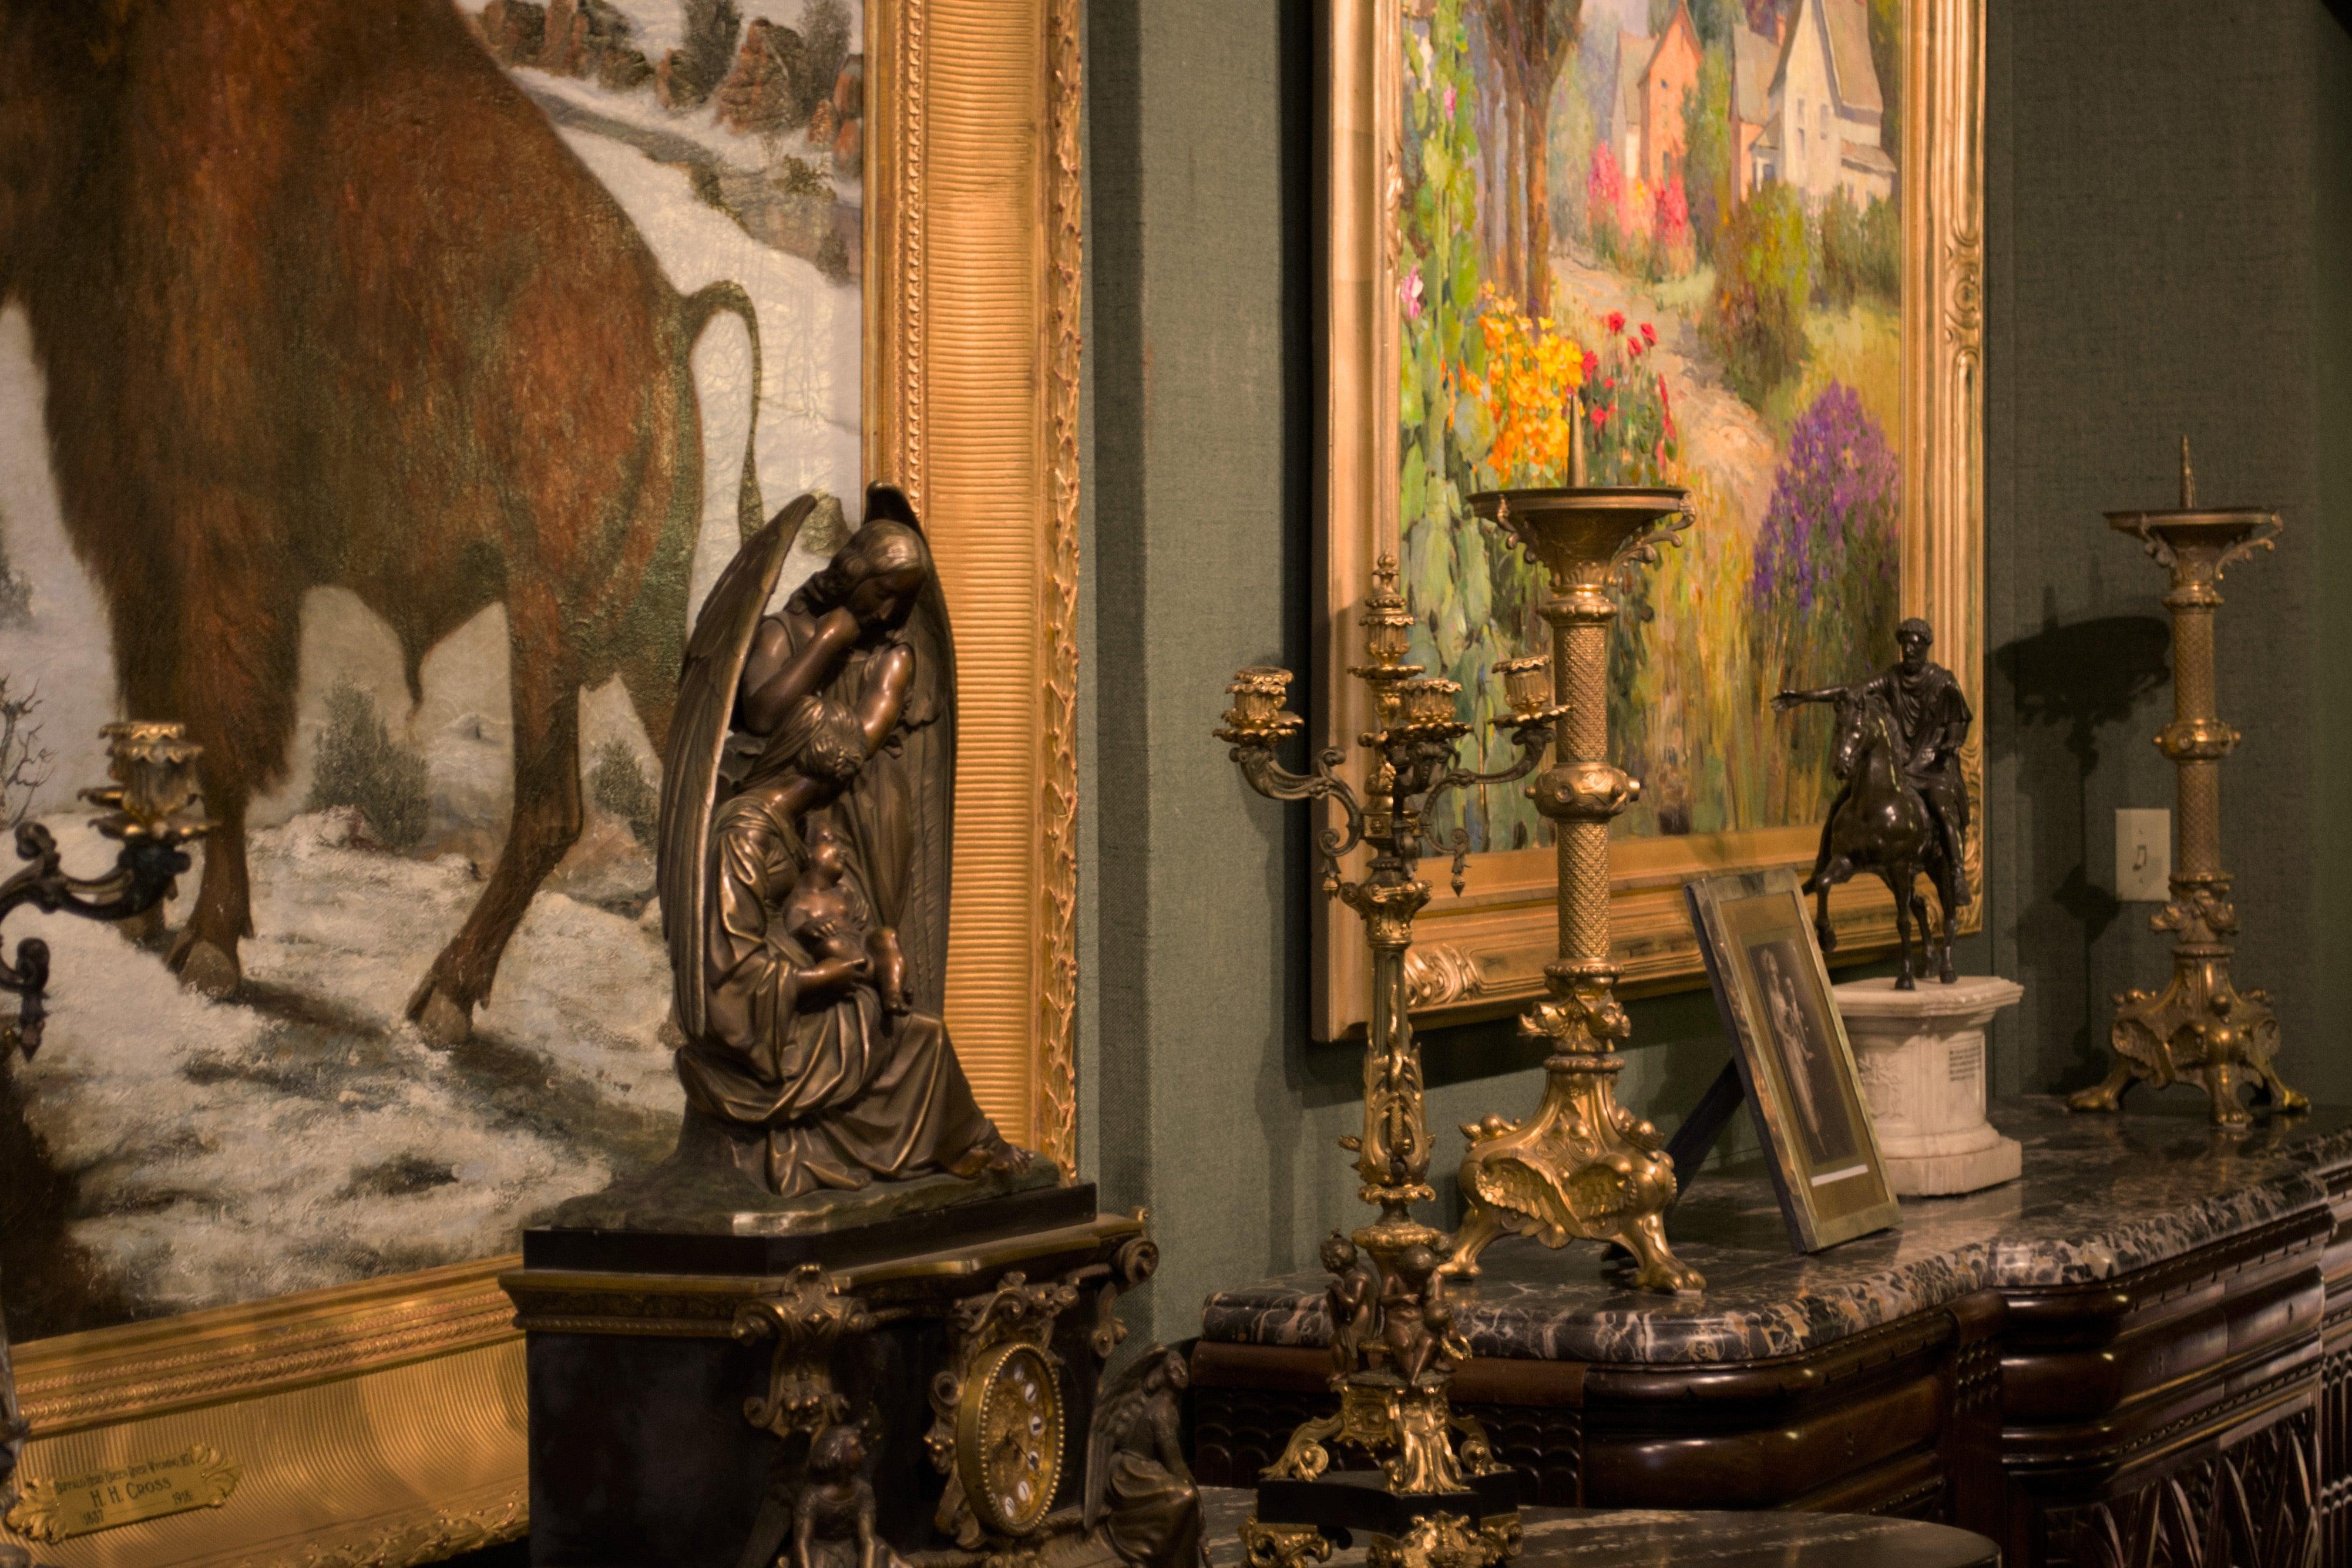 Anthony S Fine Art And Antiques Salt Lake City Ut 84111